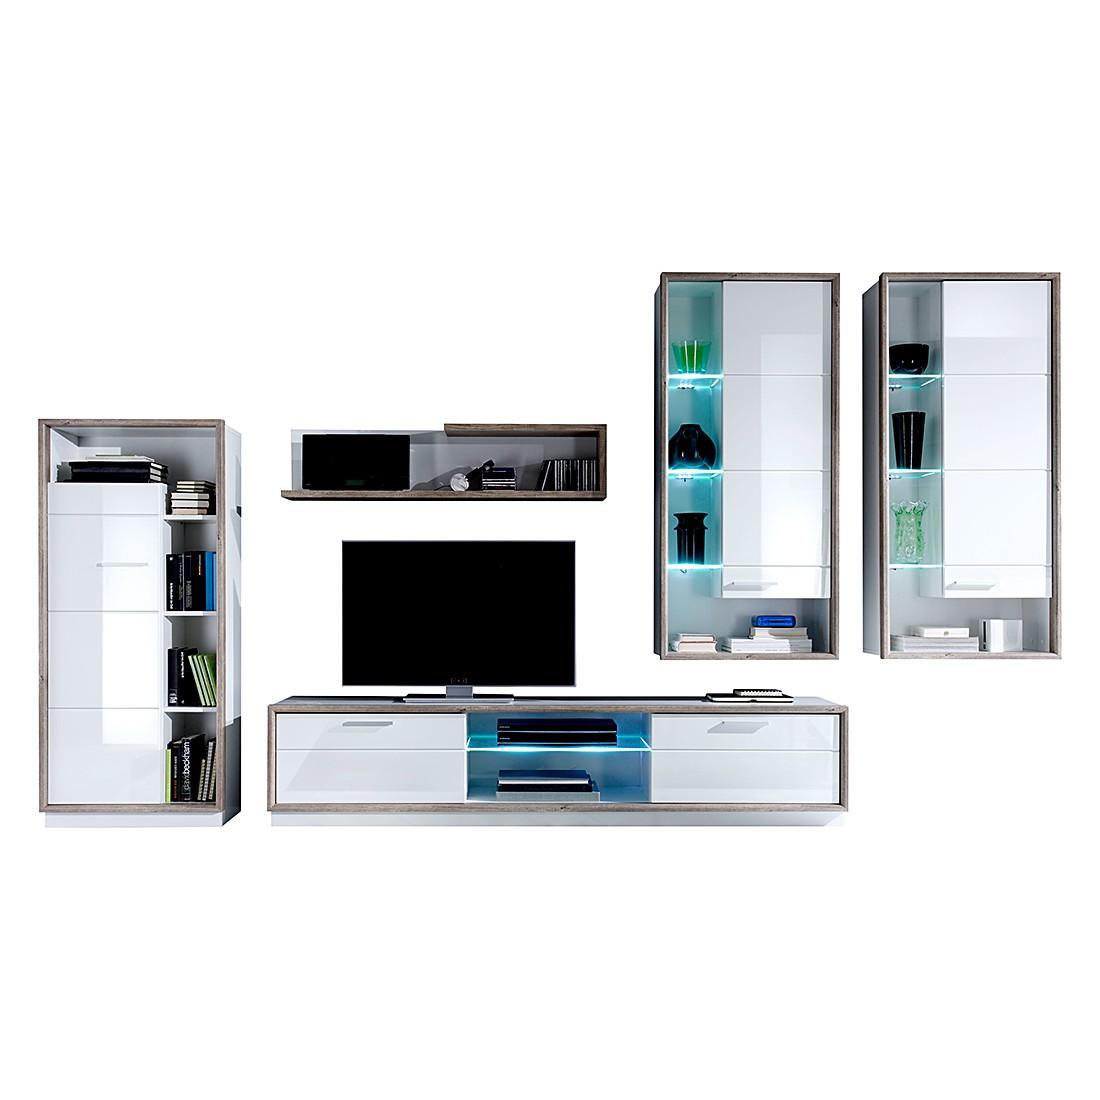 wohnwand bacara i 5 teilig inkl beleuchtung wei hochglanz. Black Bedroom Furniture Sets. Home Design Ideas